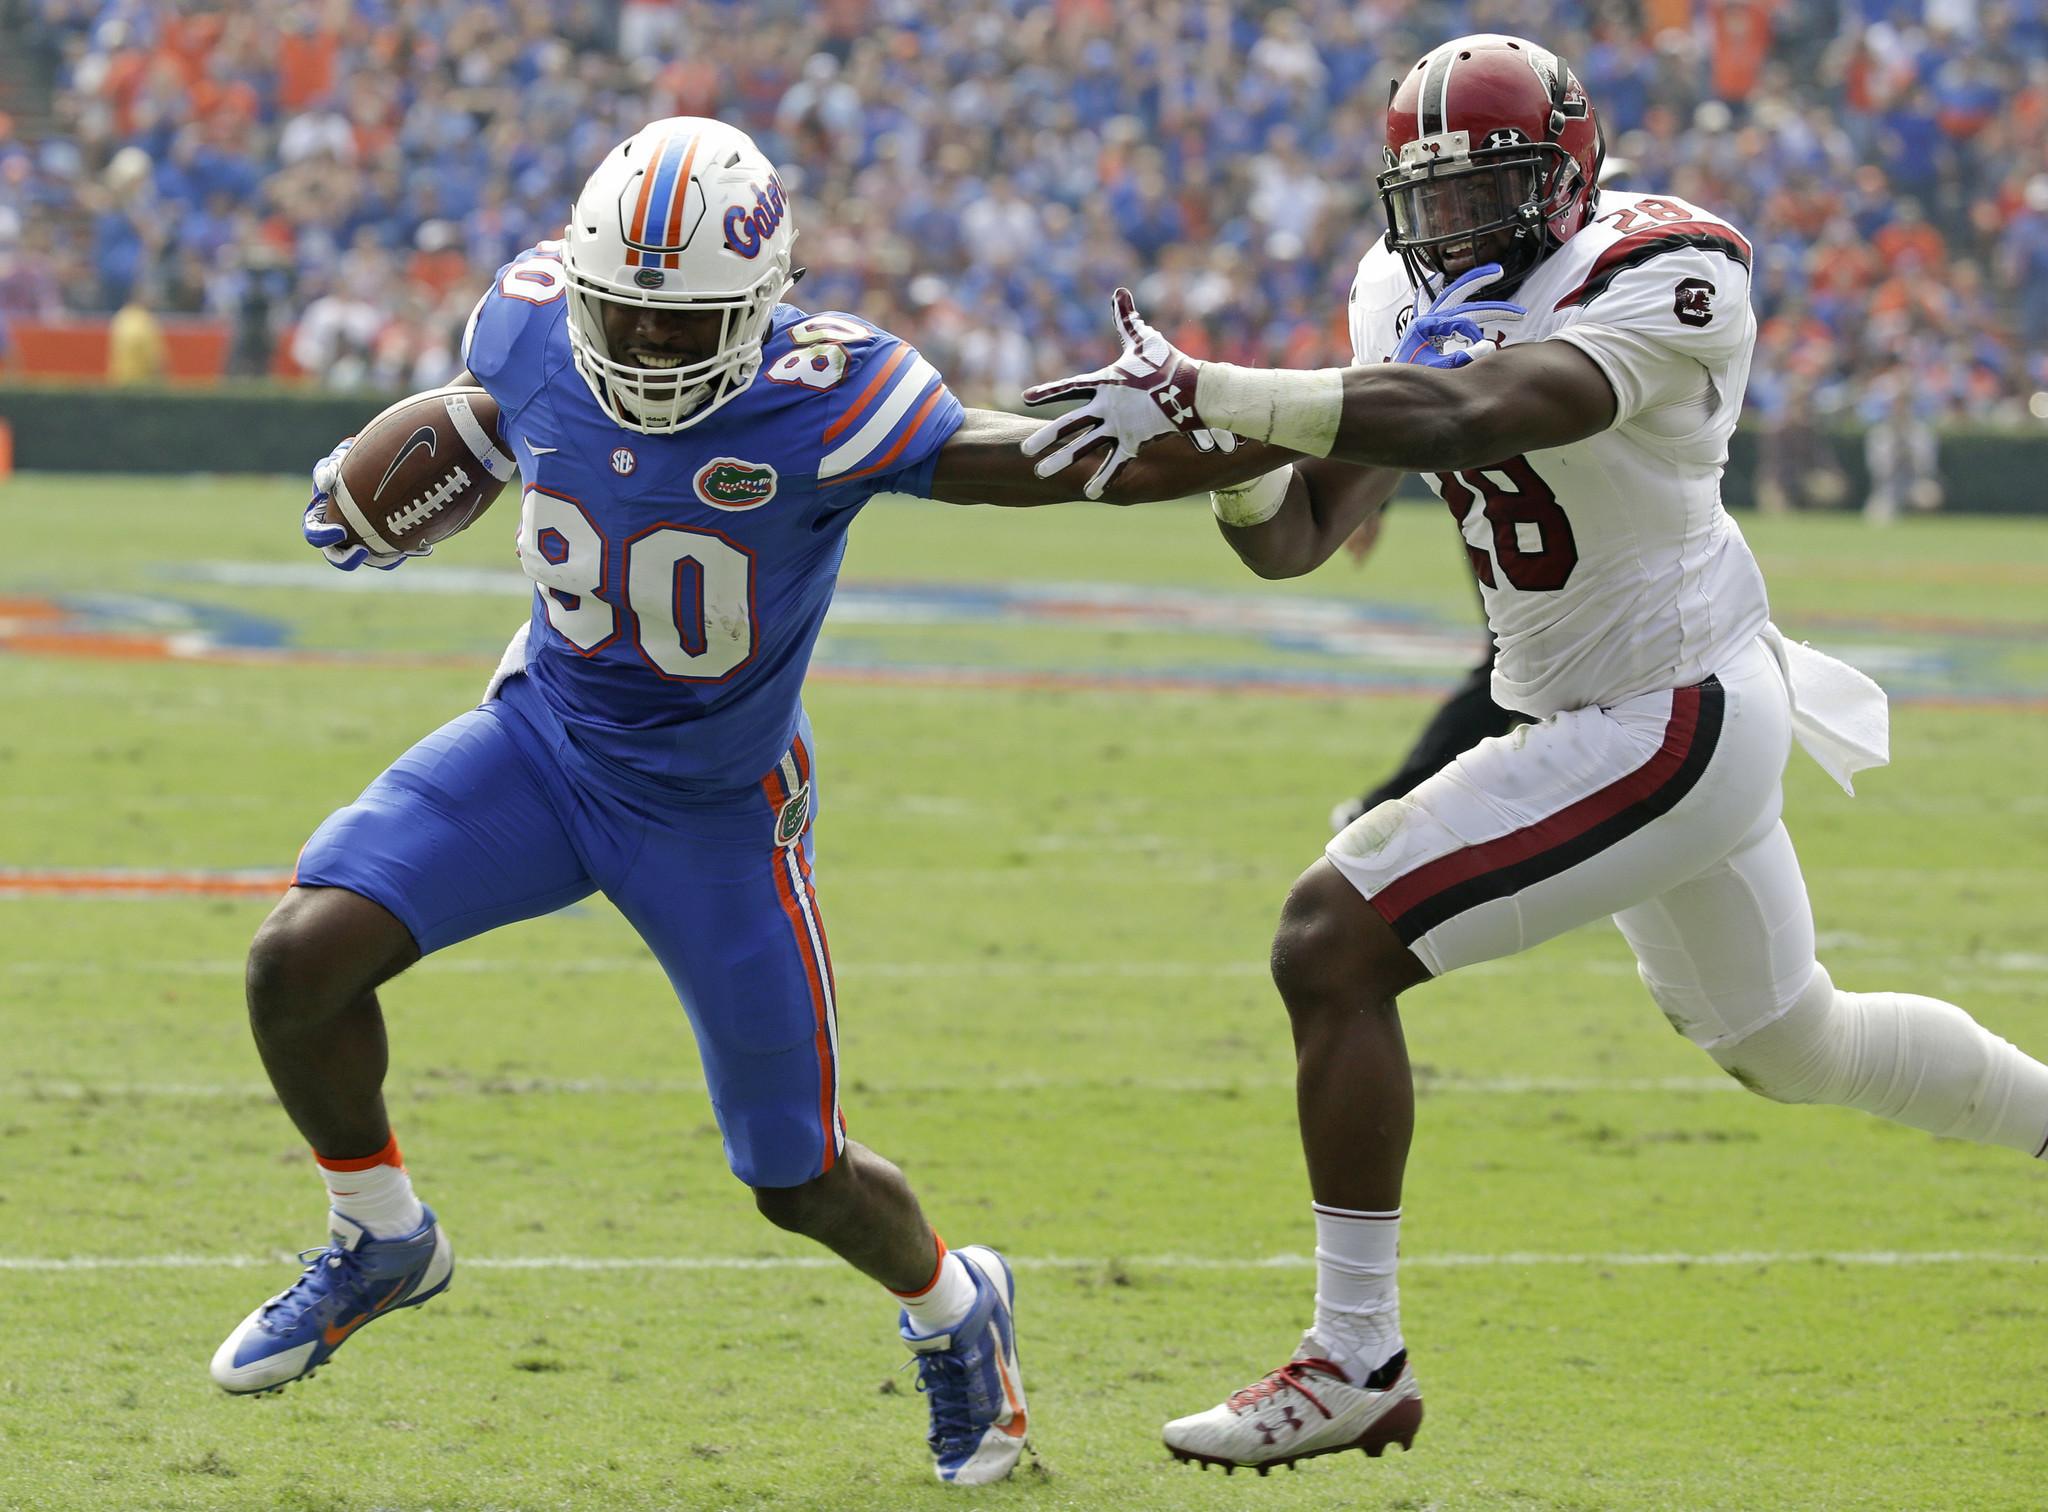 Florida beats Muschamp, South Carolina - Orlando Sentinel